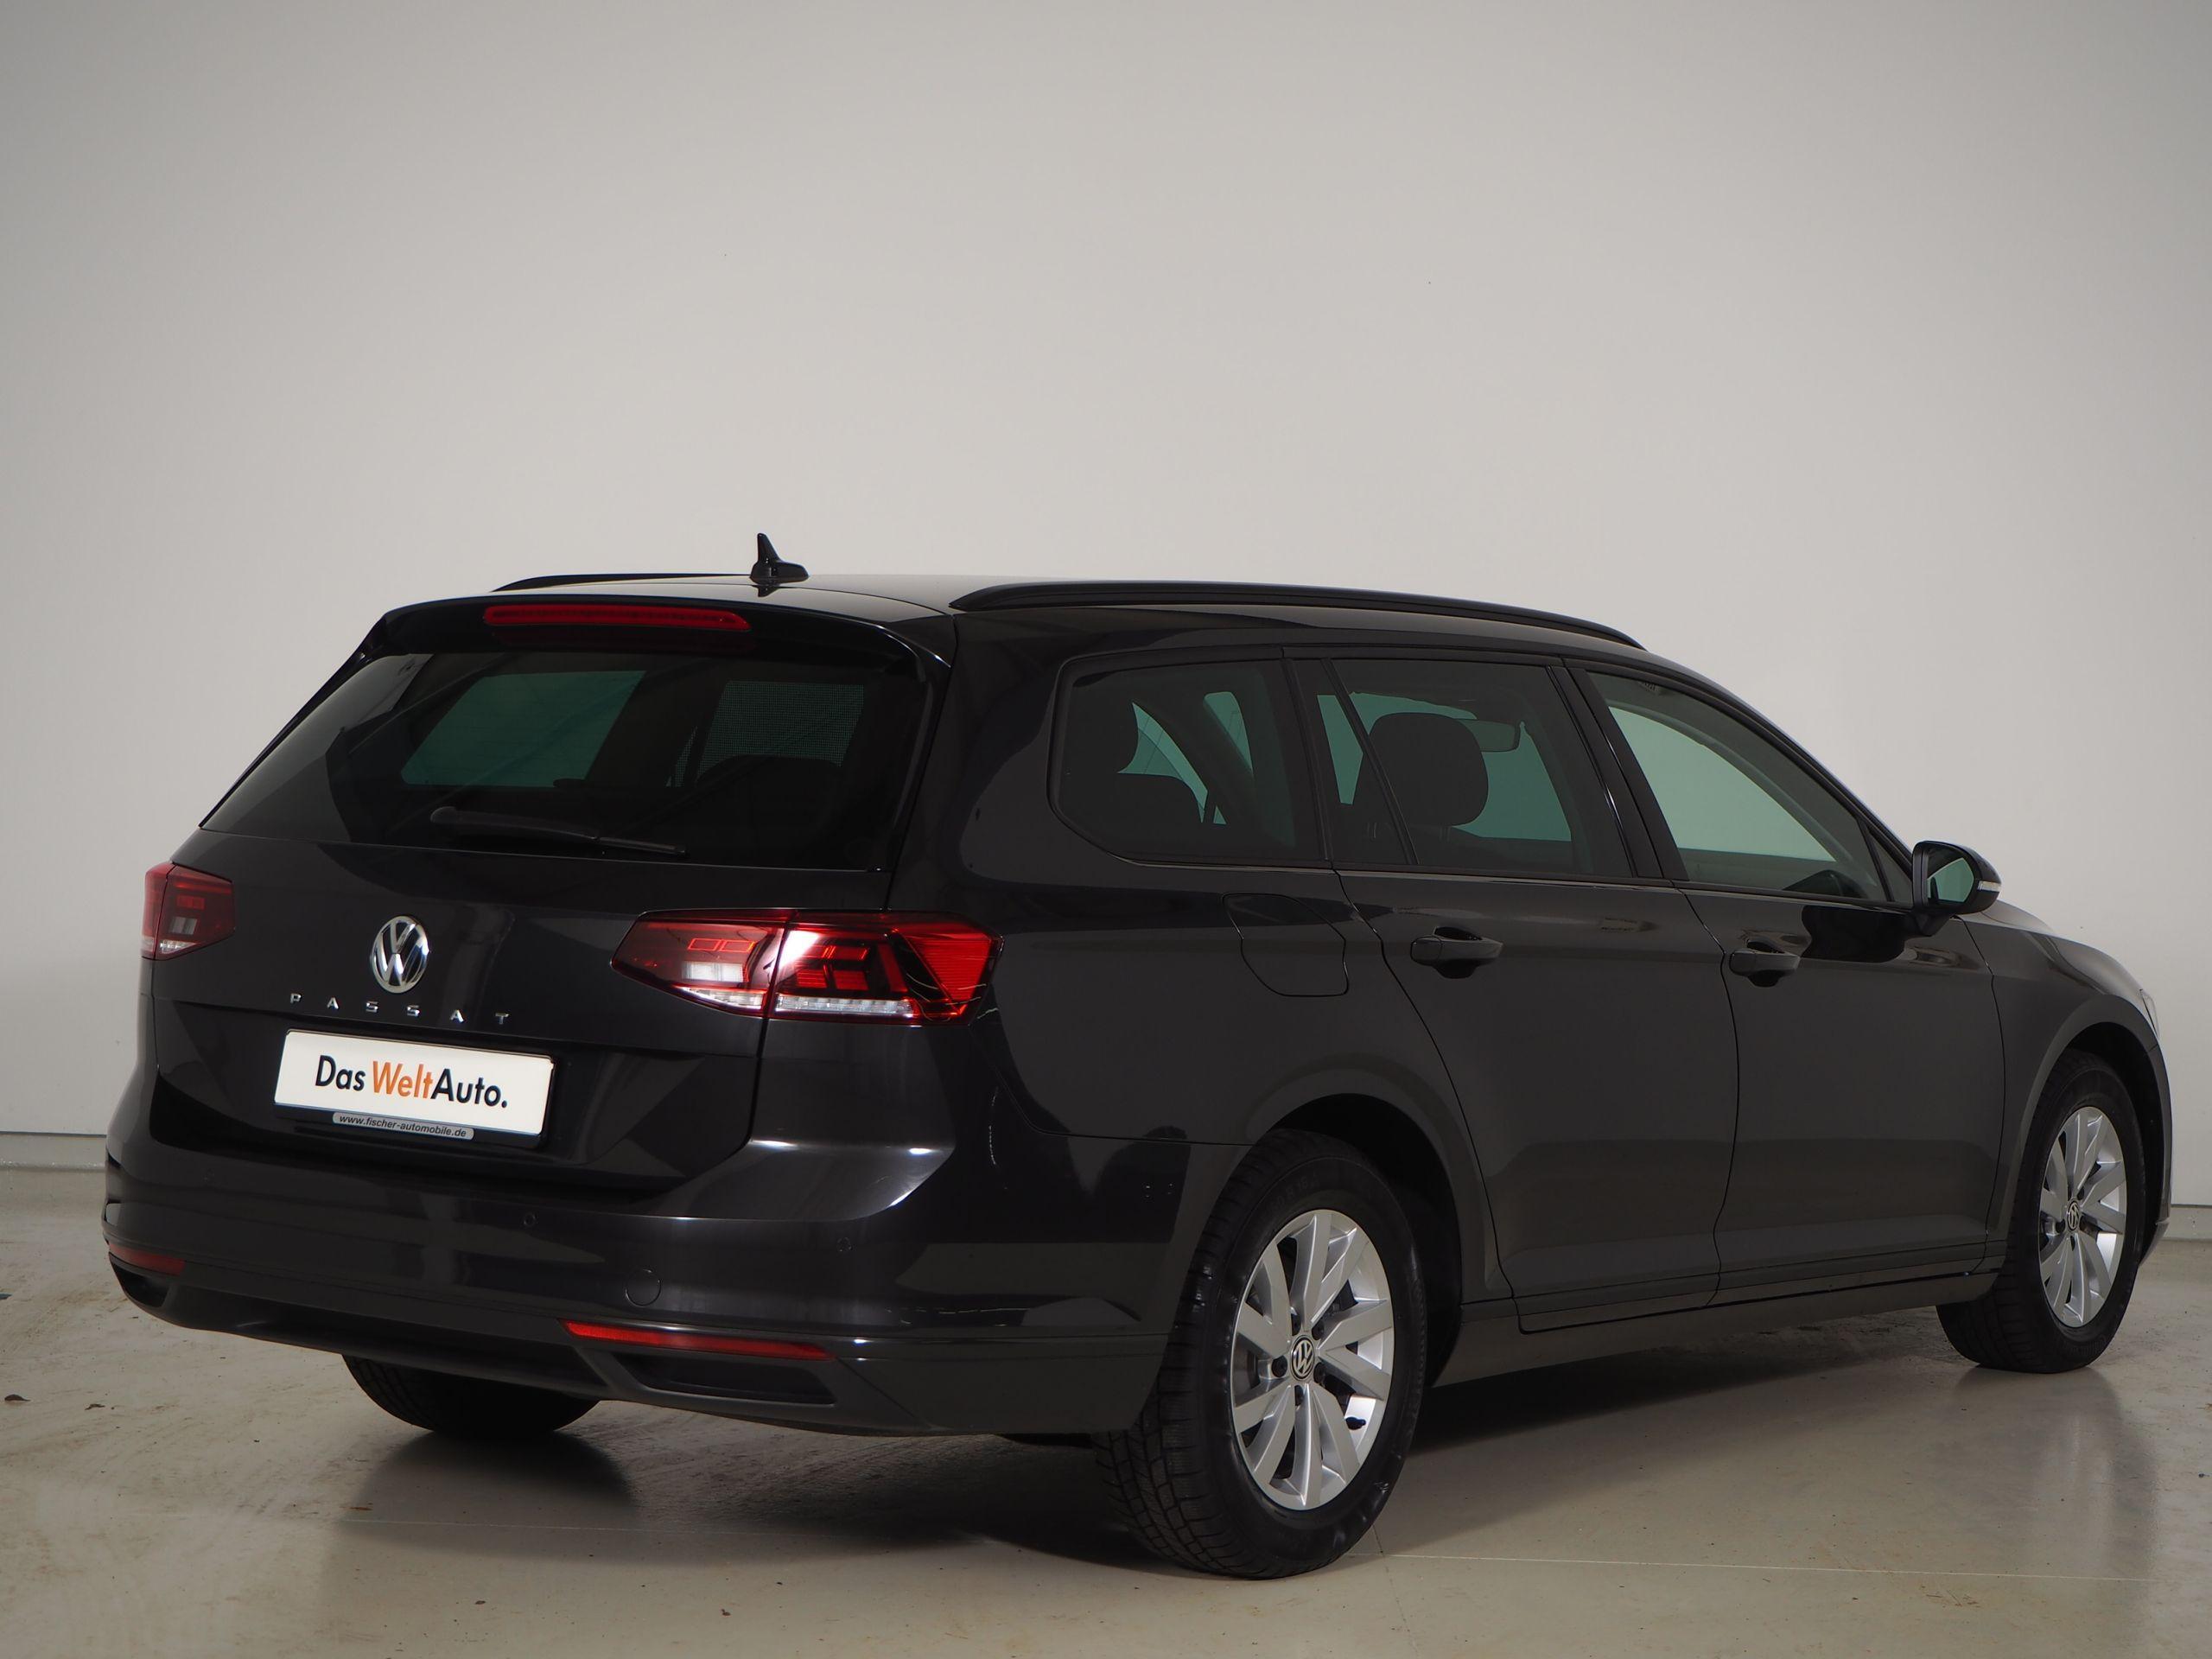 VW Passat Variant TDI 2.0 Conceptline